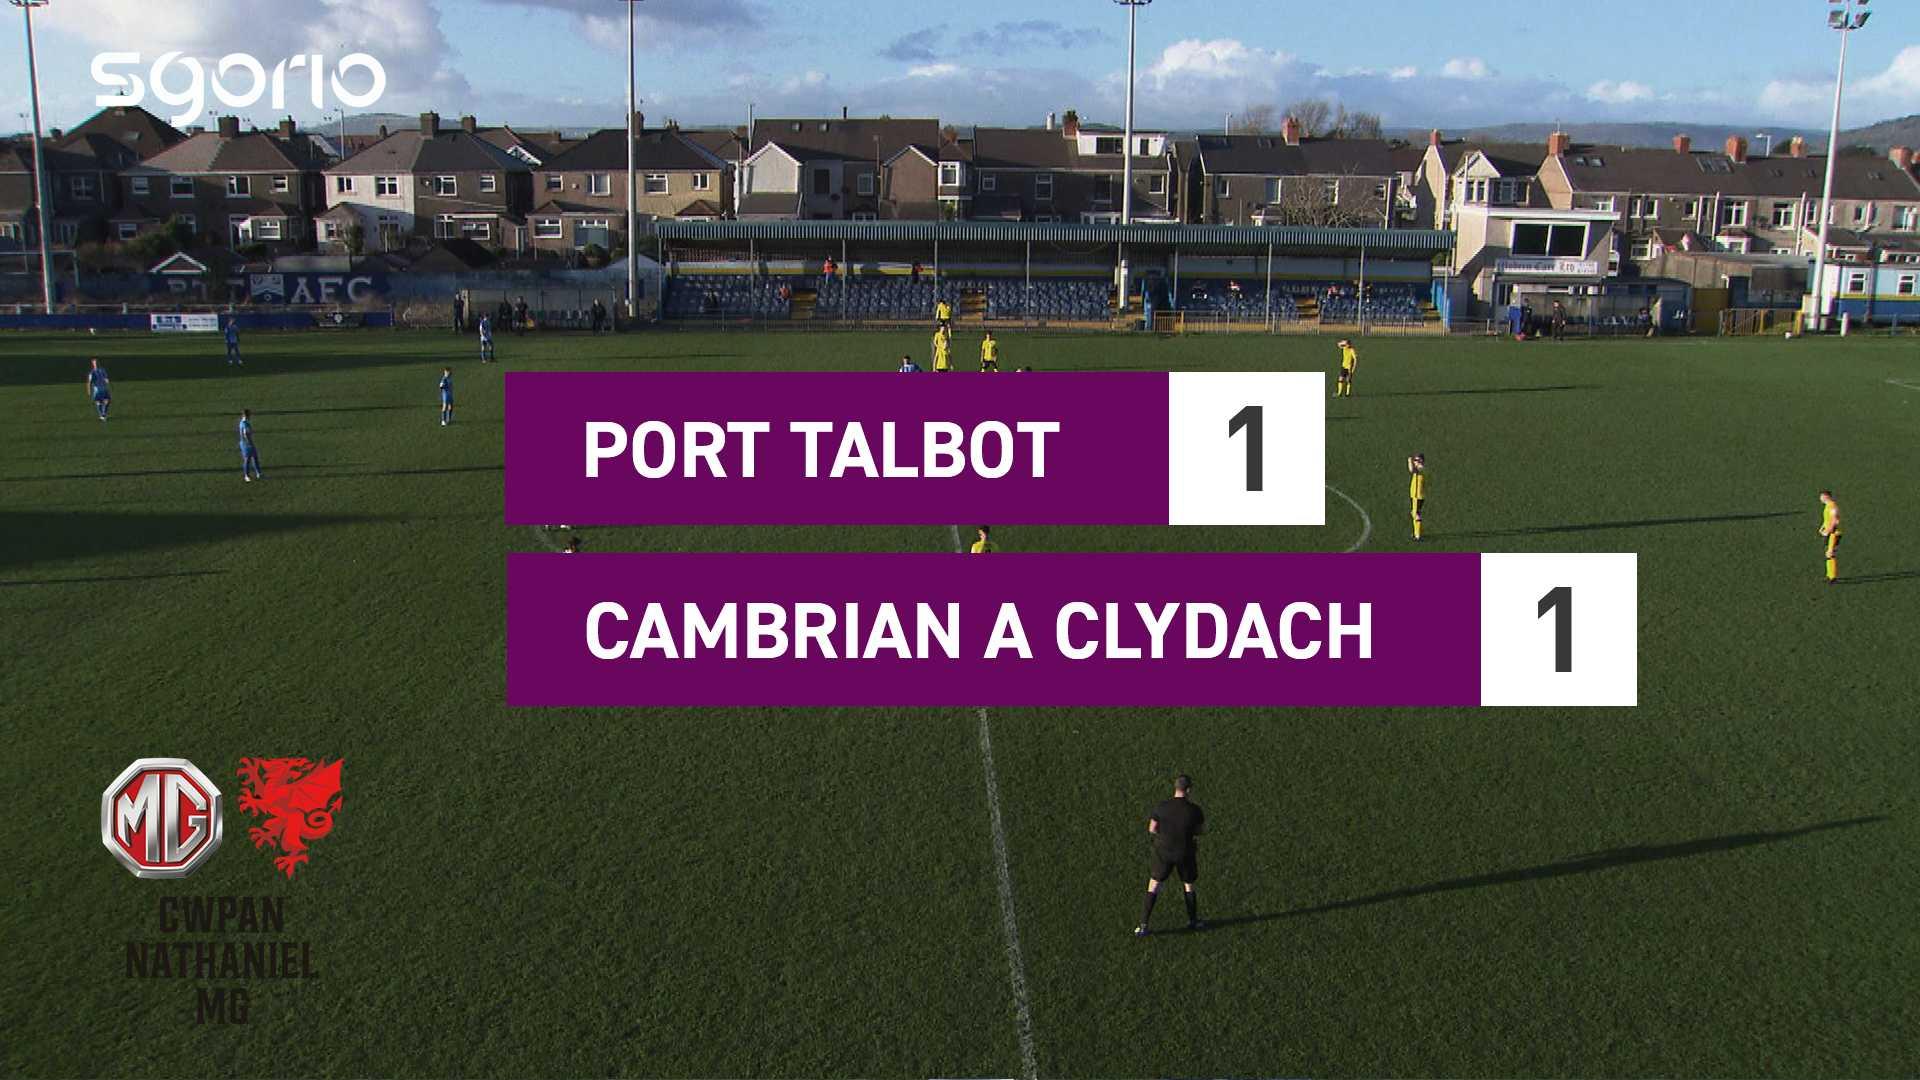 Port Talbot 1-1 Cambrian a Clydach